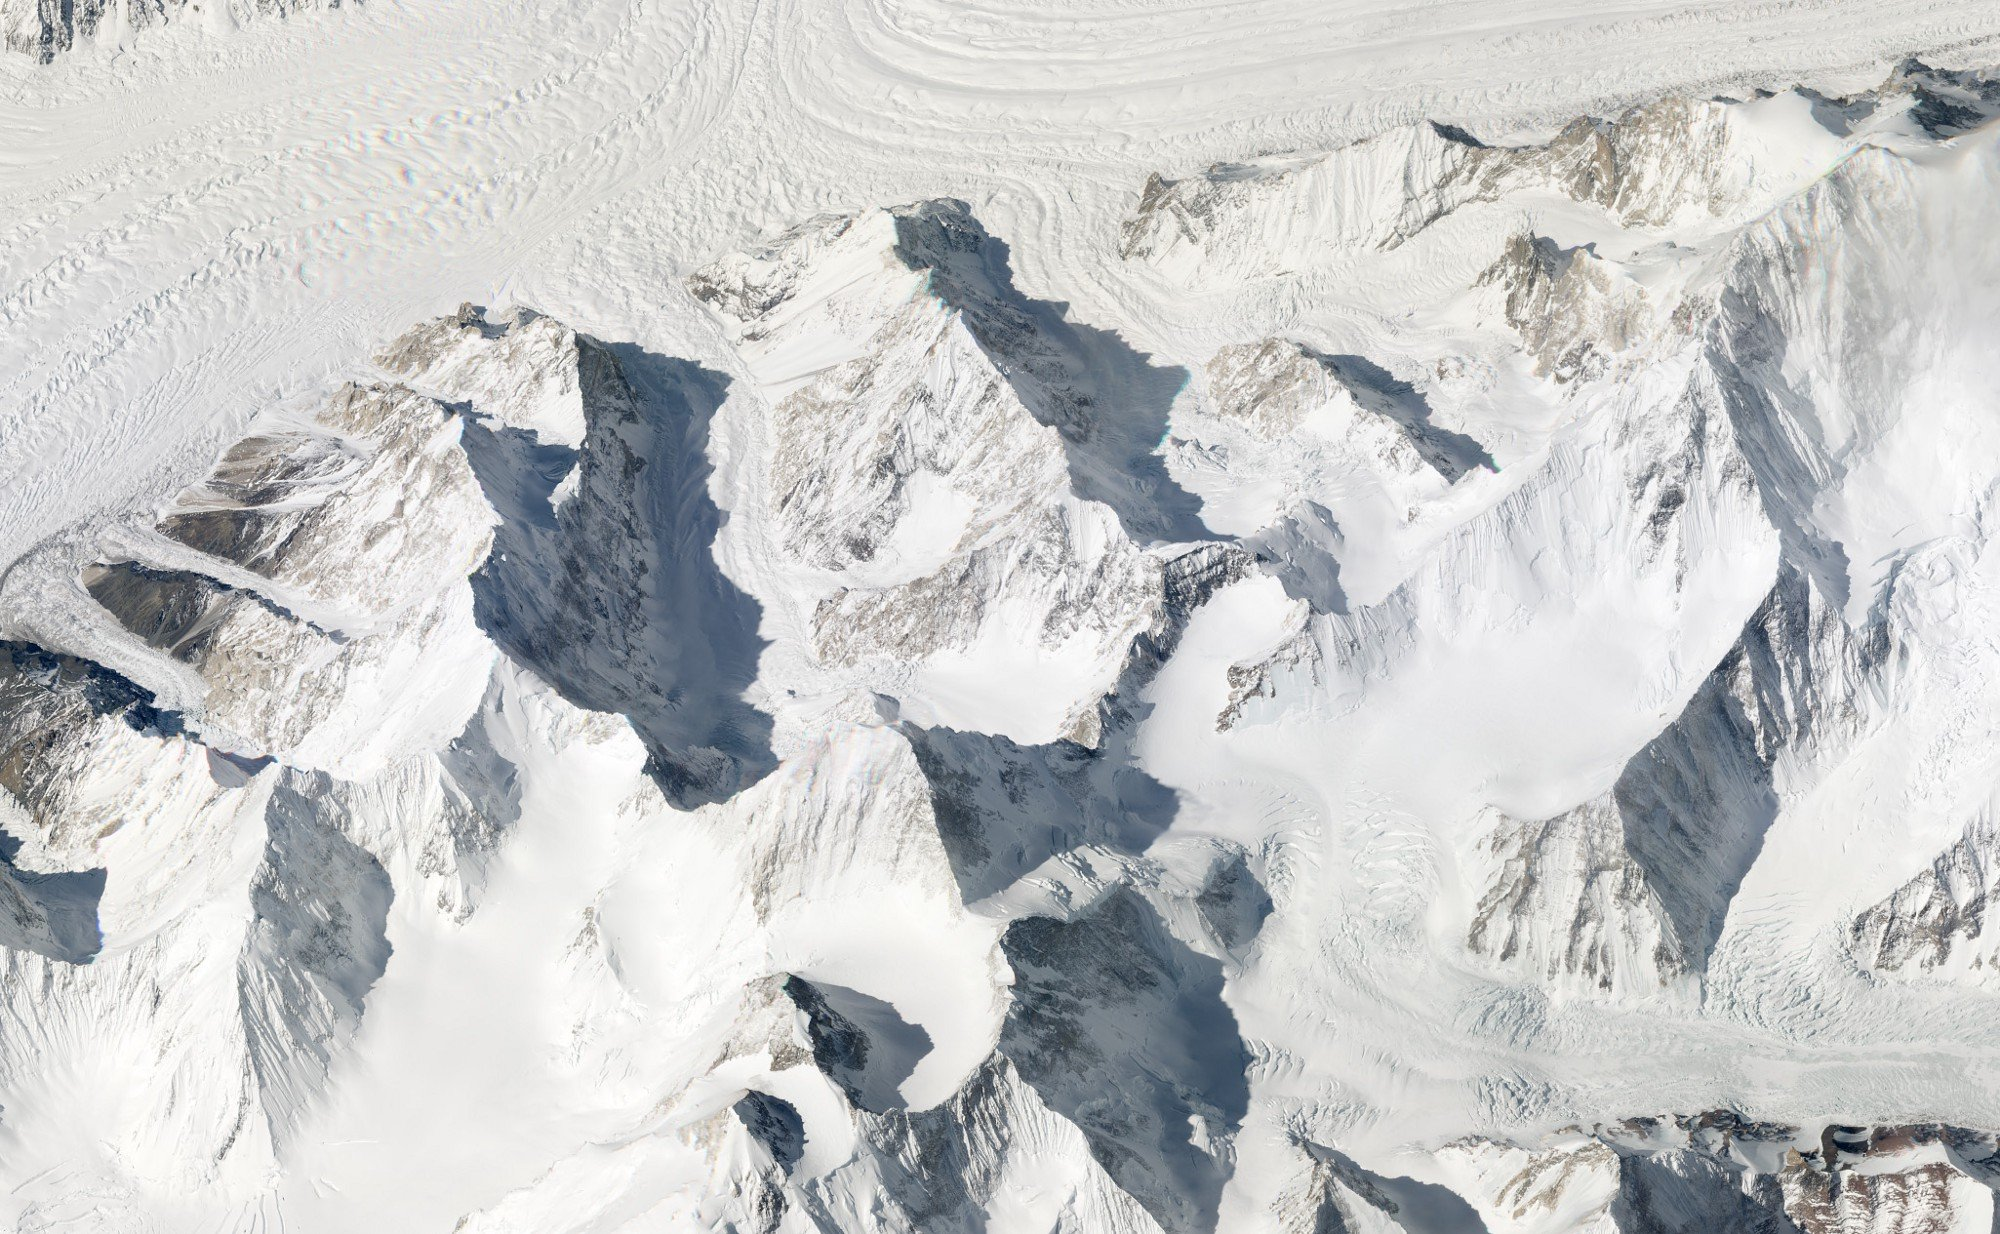 Gasherbrum Massif, Pakistan. March 11, 2018. Image ©2018 Planet Labs, Inc. cc-by-sa4.0.